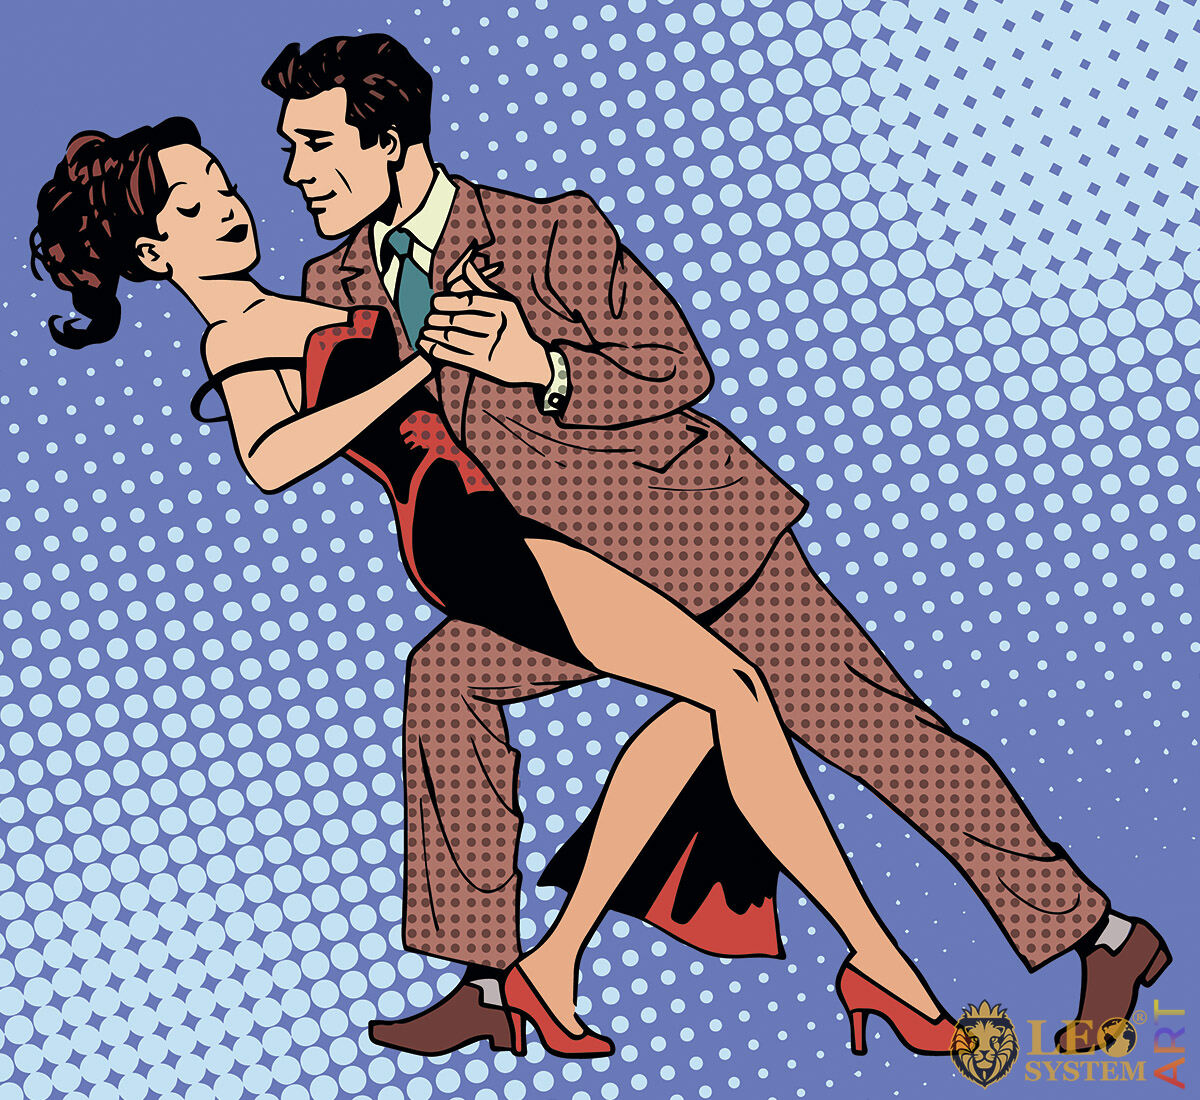 Gorgeous dancing couple